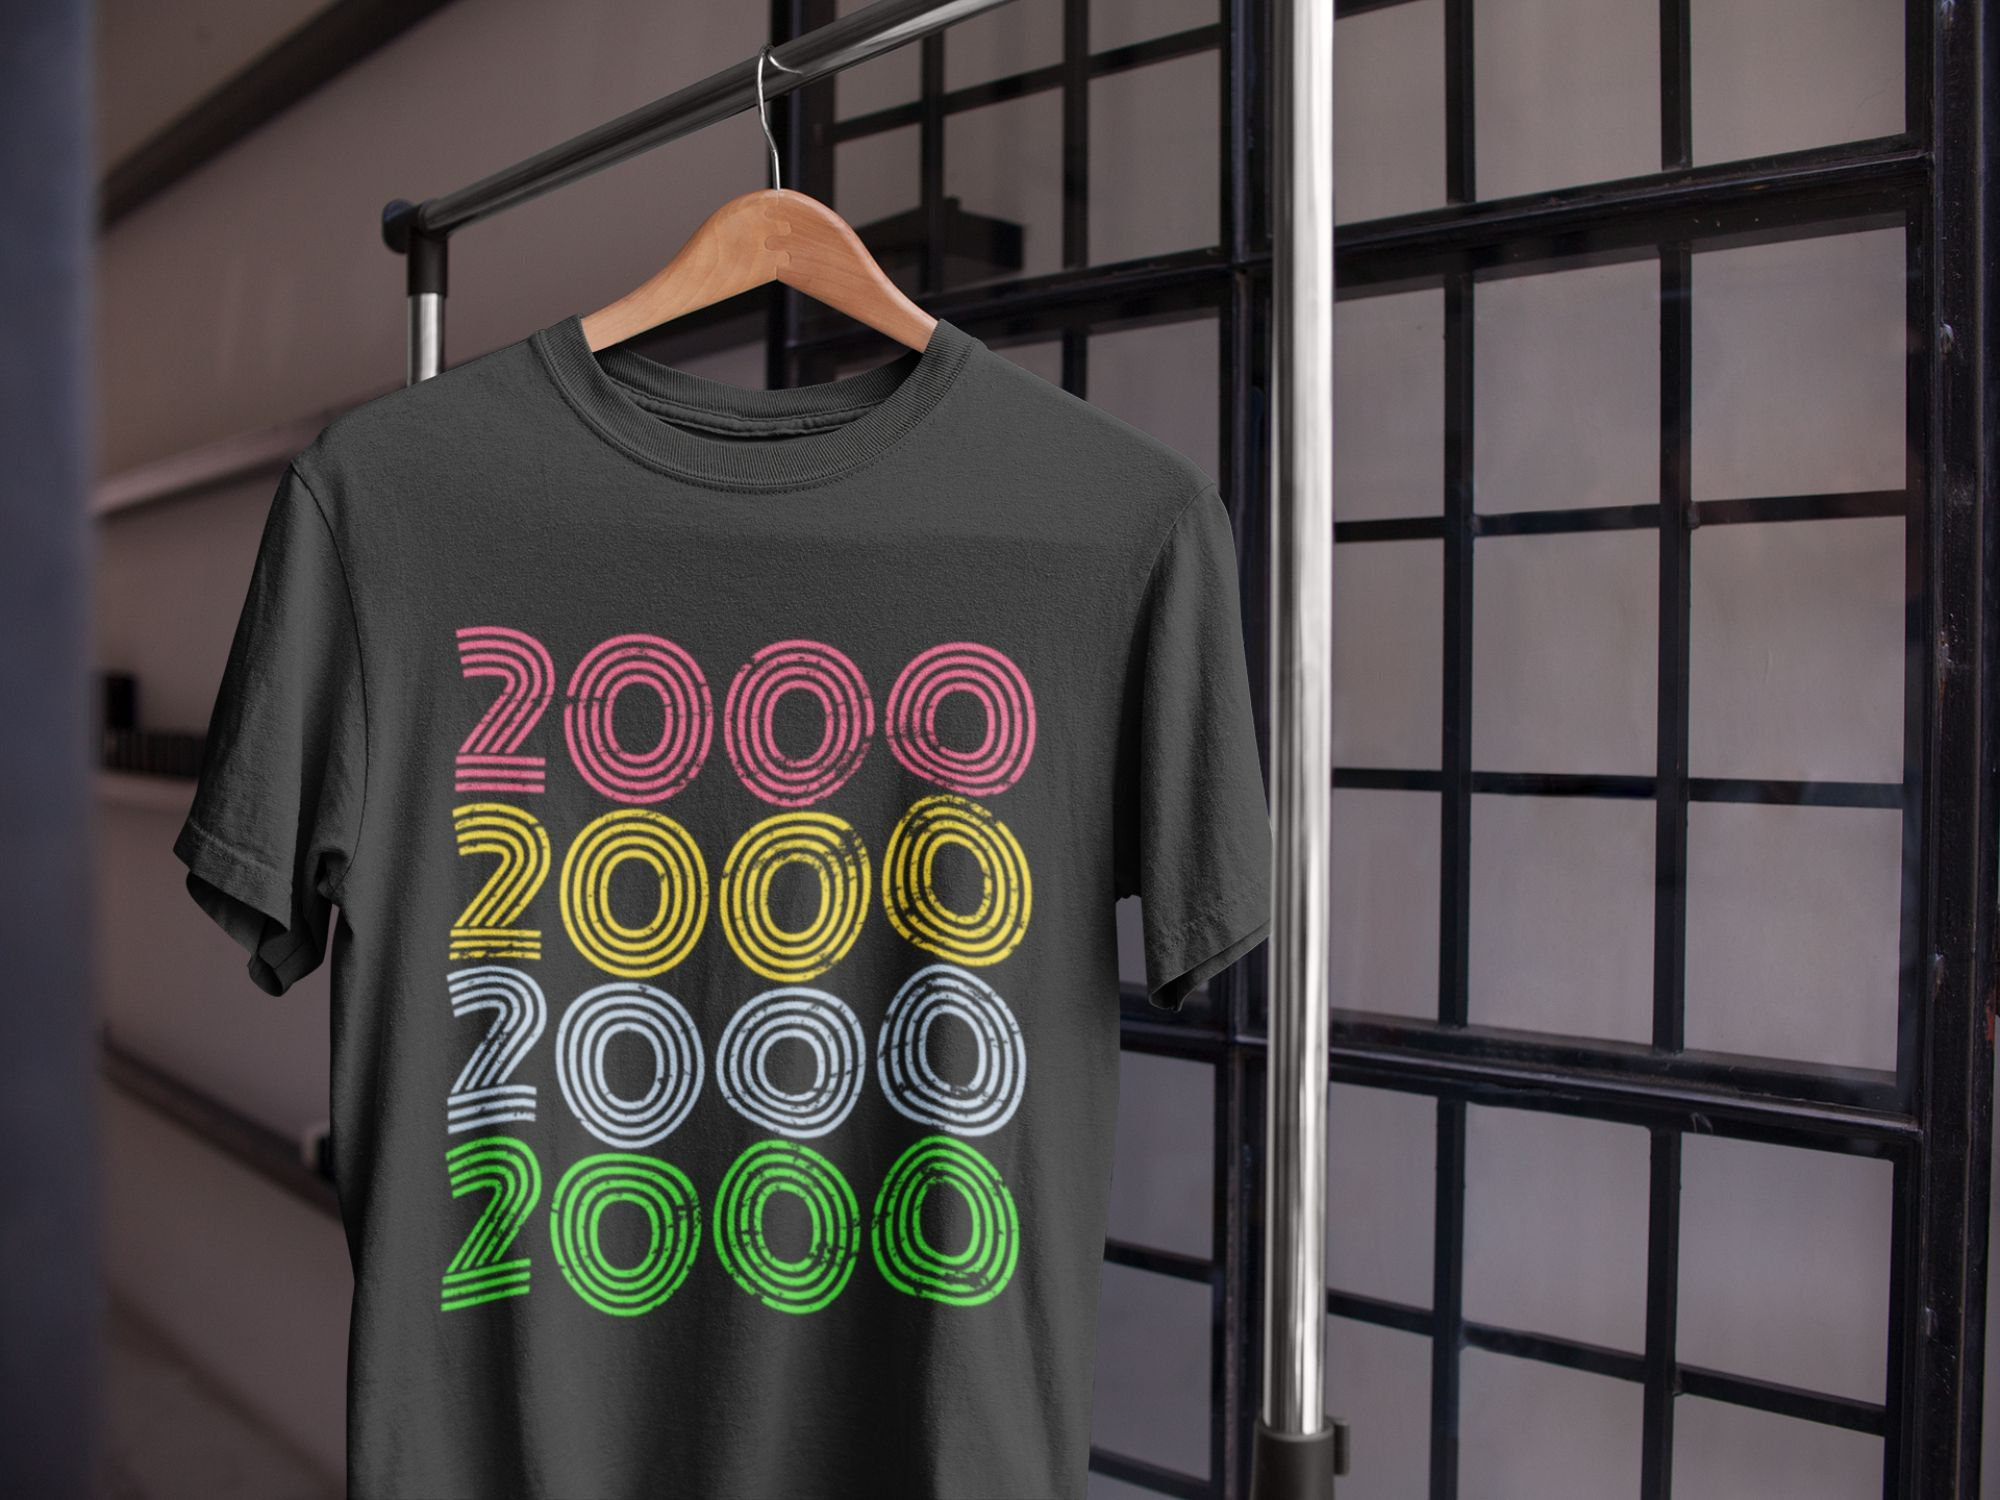 20th Birthday Shirt Twentieth Wedding Anniversary Ideas